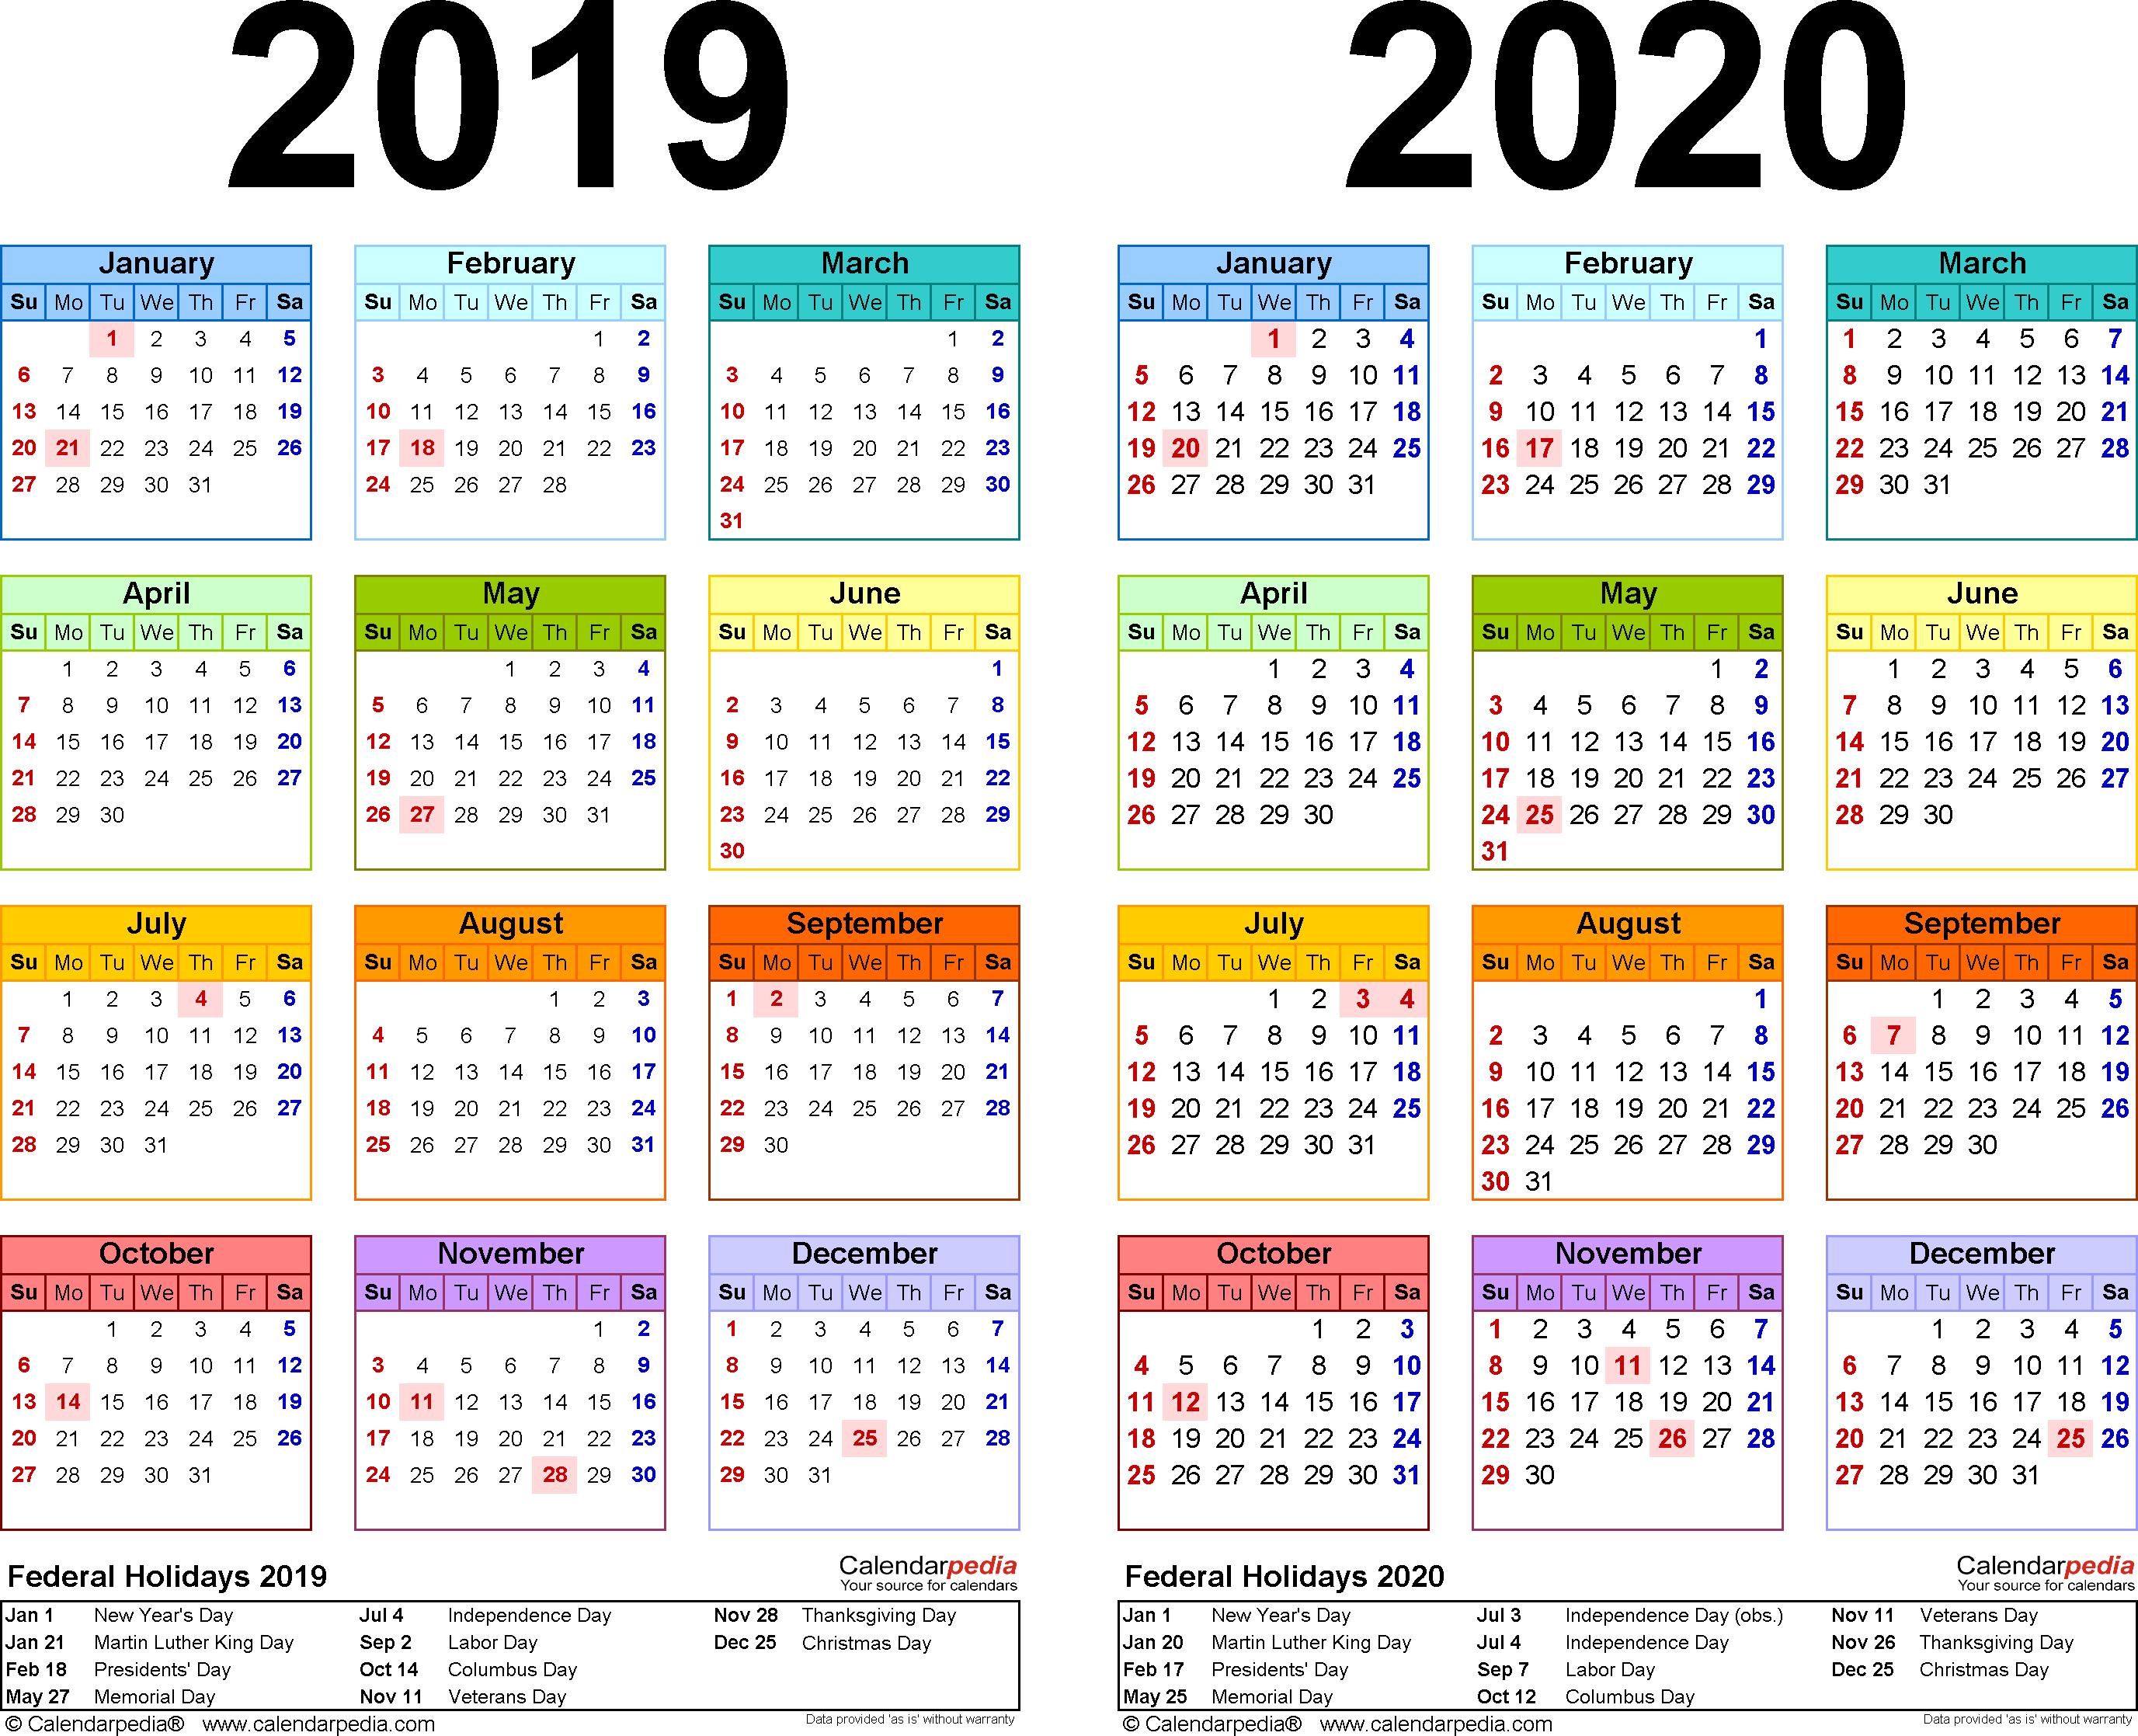 2019-2020 Calendar - Free Printable Two-Year Excel Calendars regarding U Of M 2019 2020 Calendar